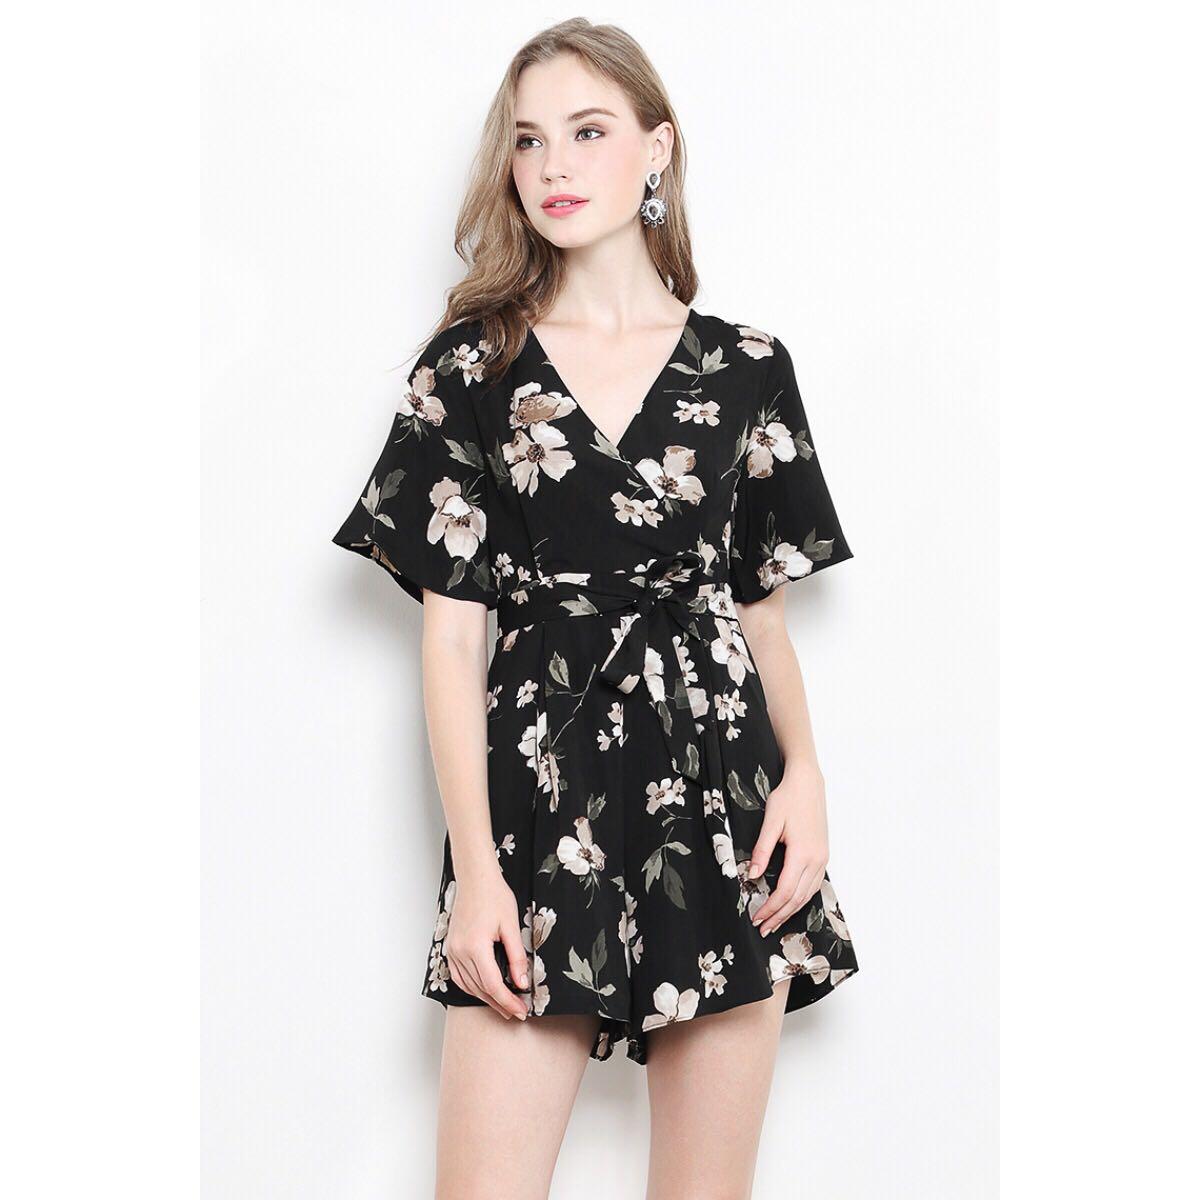 5b5d1aba39f Shopsassydream Anna Playsuit Black Floral